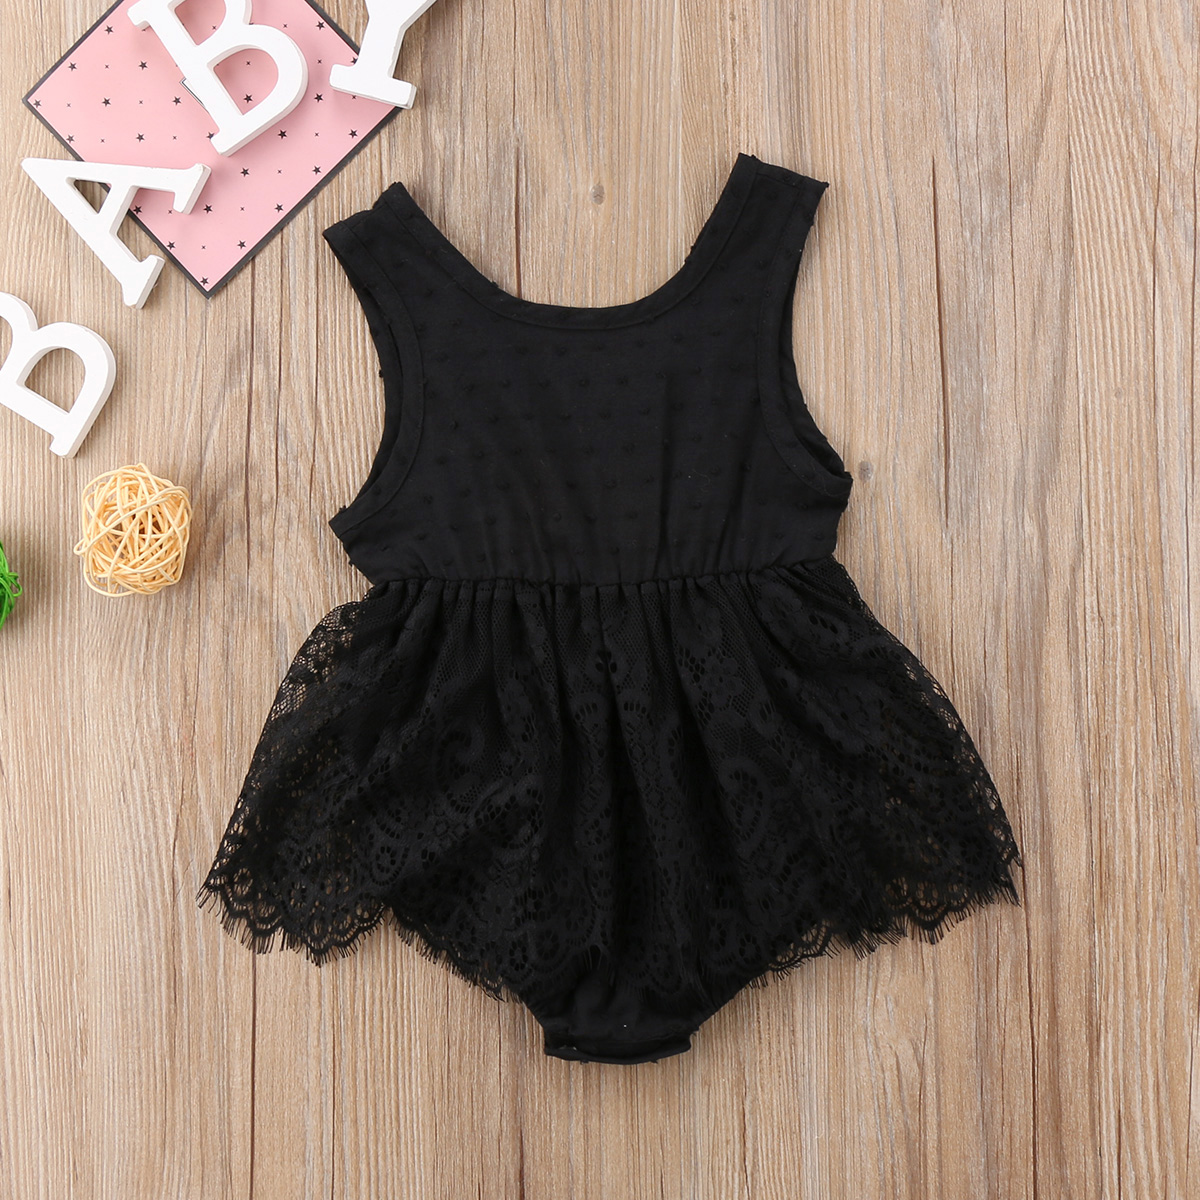 Fashion Baby Girls Infant Newborn Lace Tutu Bodysuit Summer Clothes 0-18M Baby Clothing Bodysuit Dress